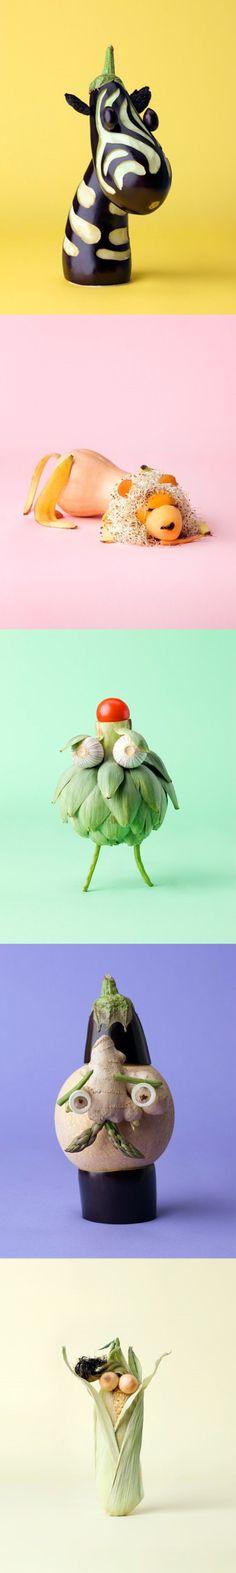 63 Ideas Fruit Design For Kids Snacks Die Mango - Frutti Decorati Vegetable Decoration, Vegetable Crafts, Food Carving, Pumpkin Carving, Kawaii Fruit, Fruit Cartoon, Mango, Food Sculpture, Creative Kids Snacks